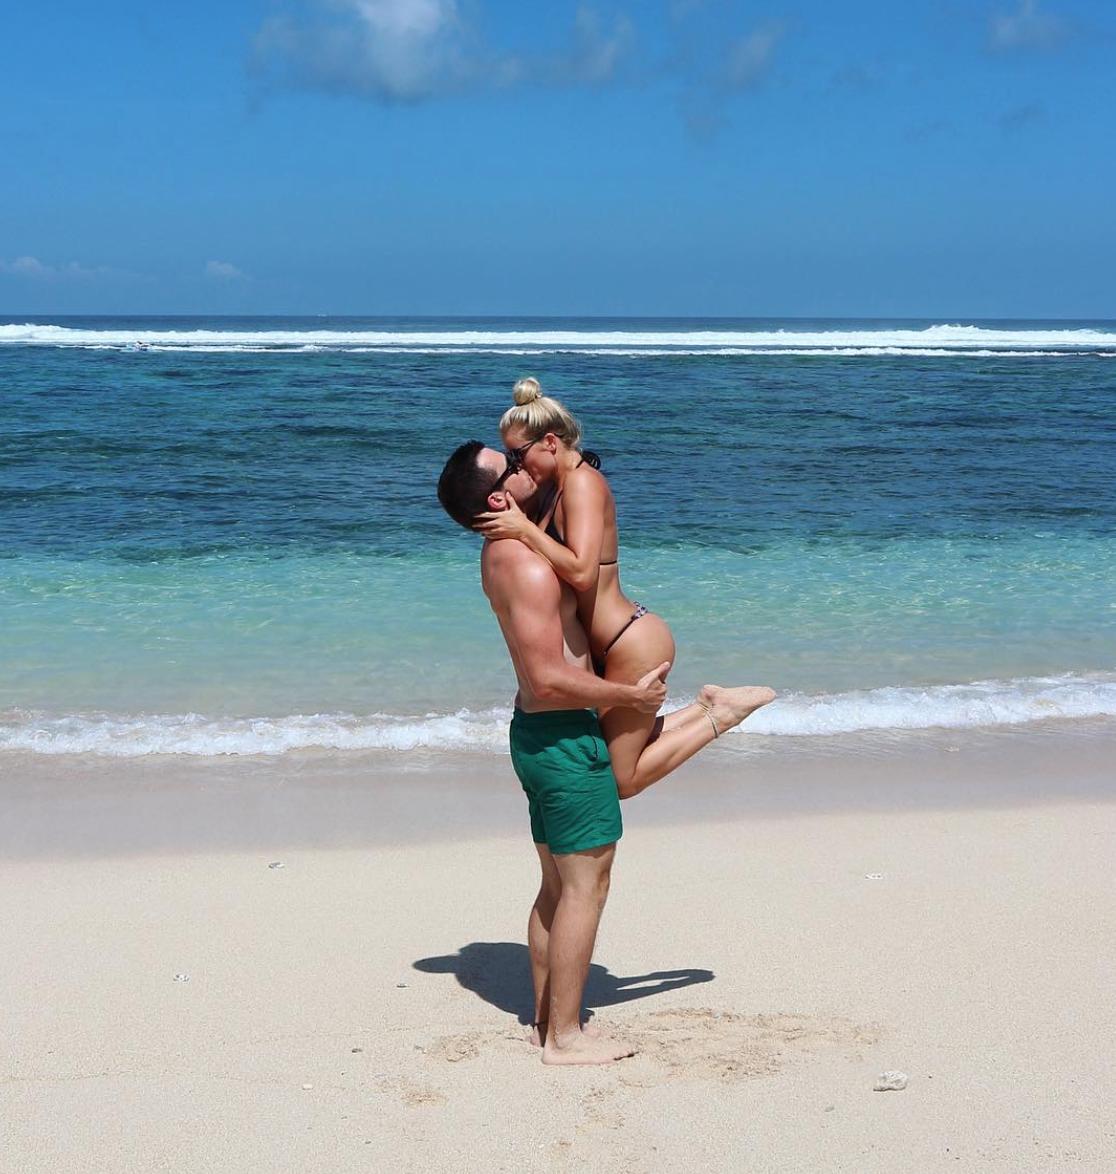 Being romantic -  Sunday's Beach Club, Uluwatu, Bali